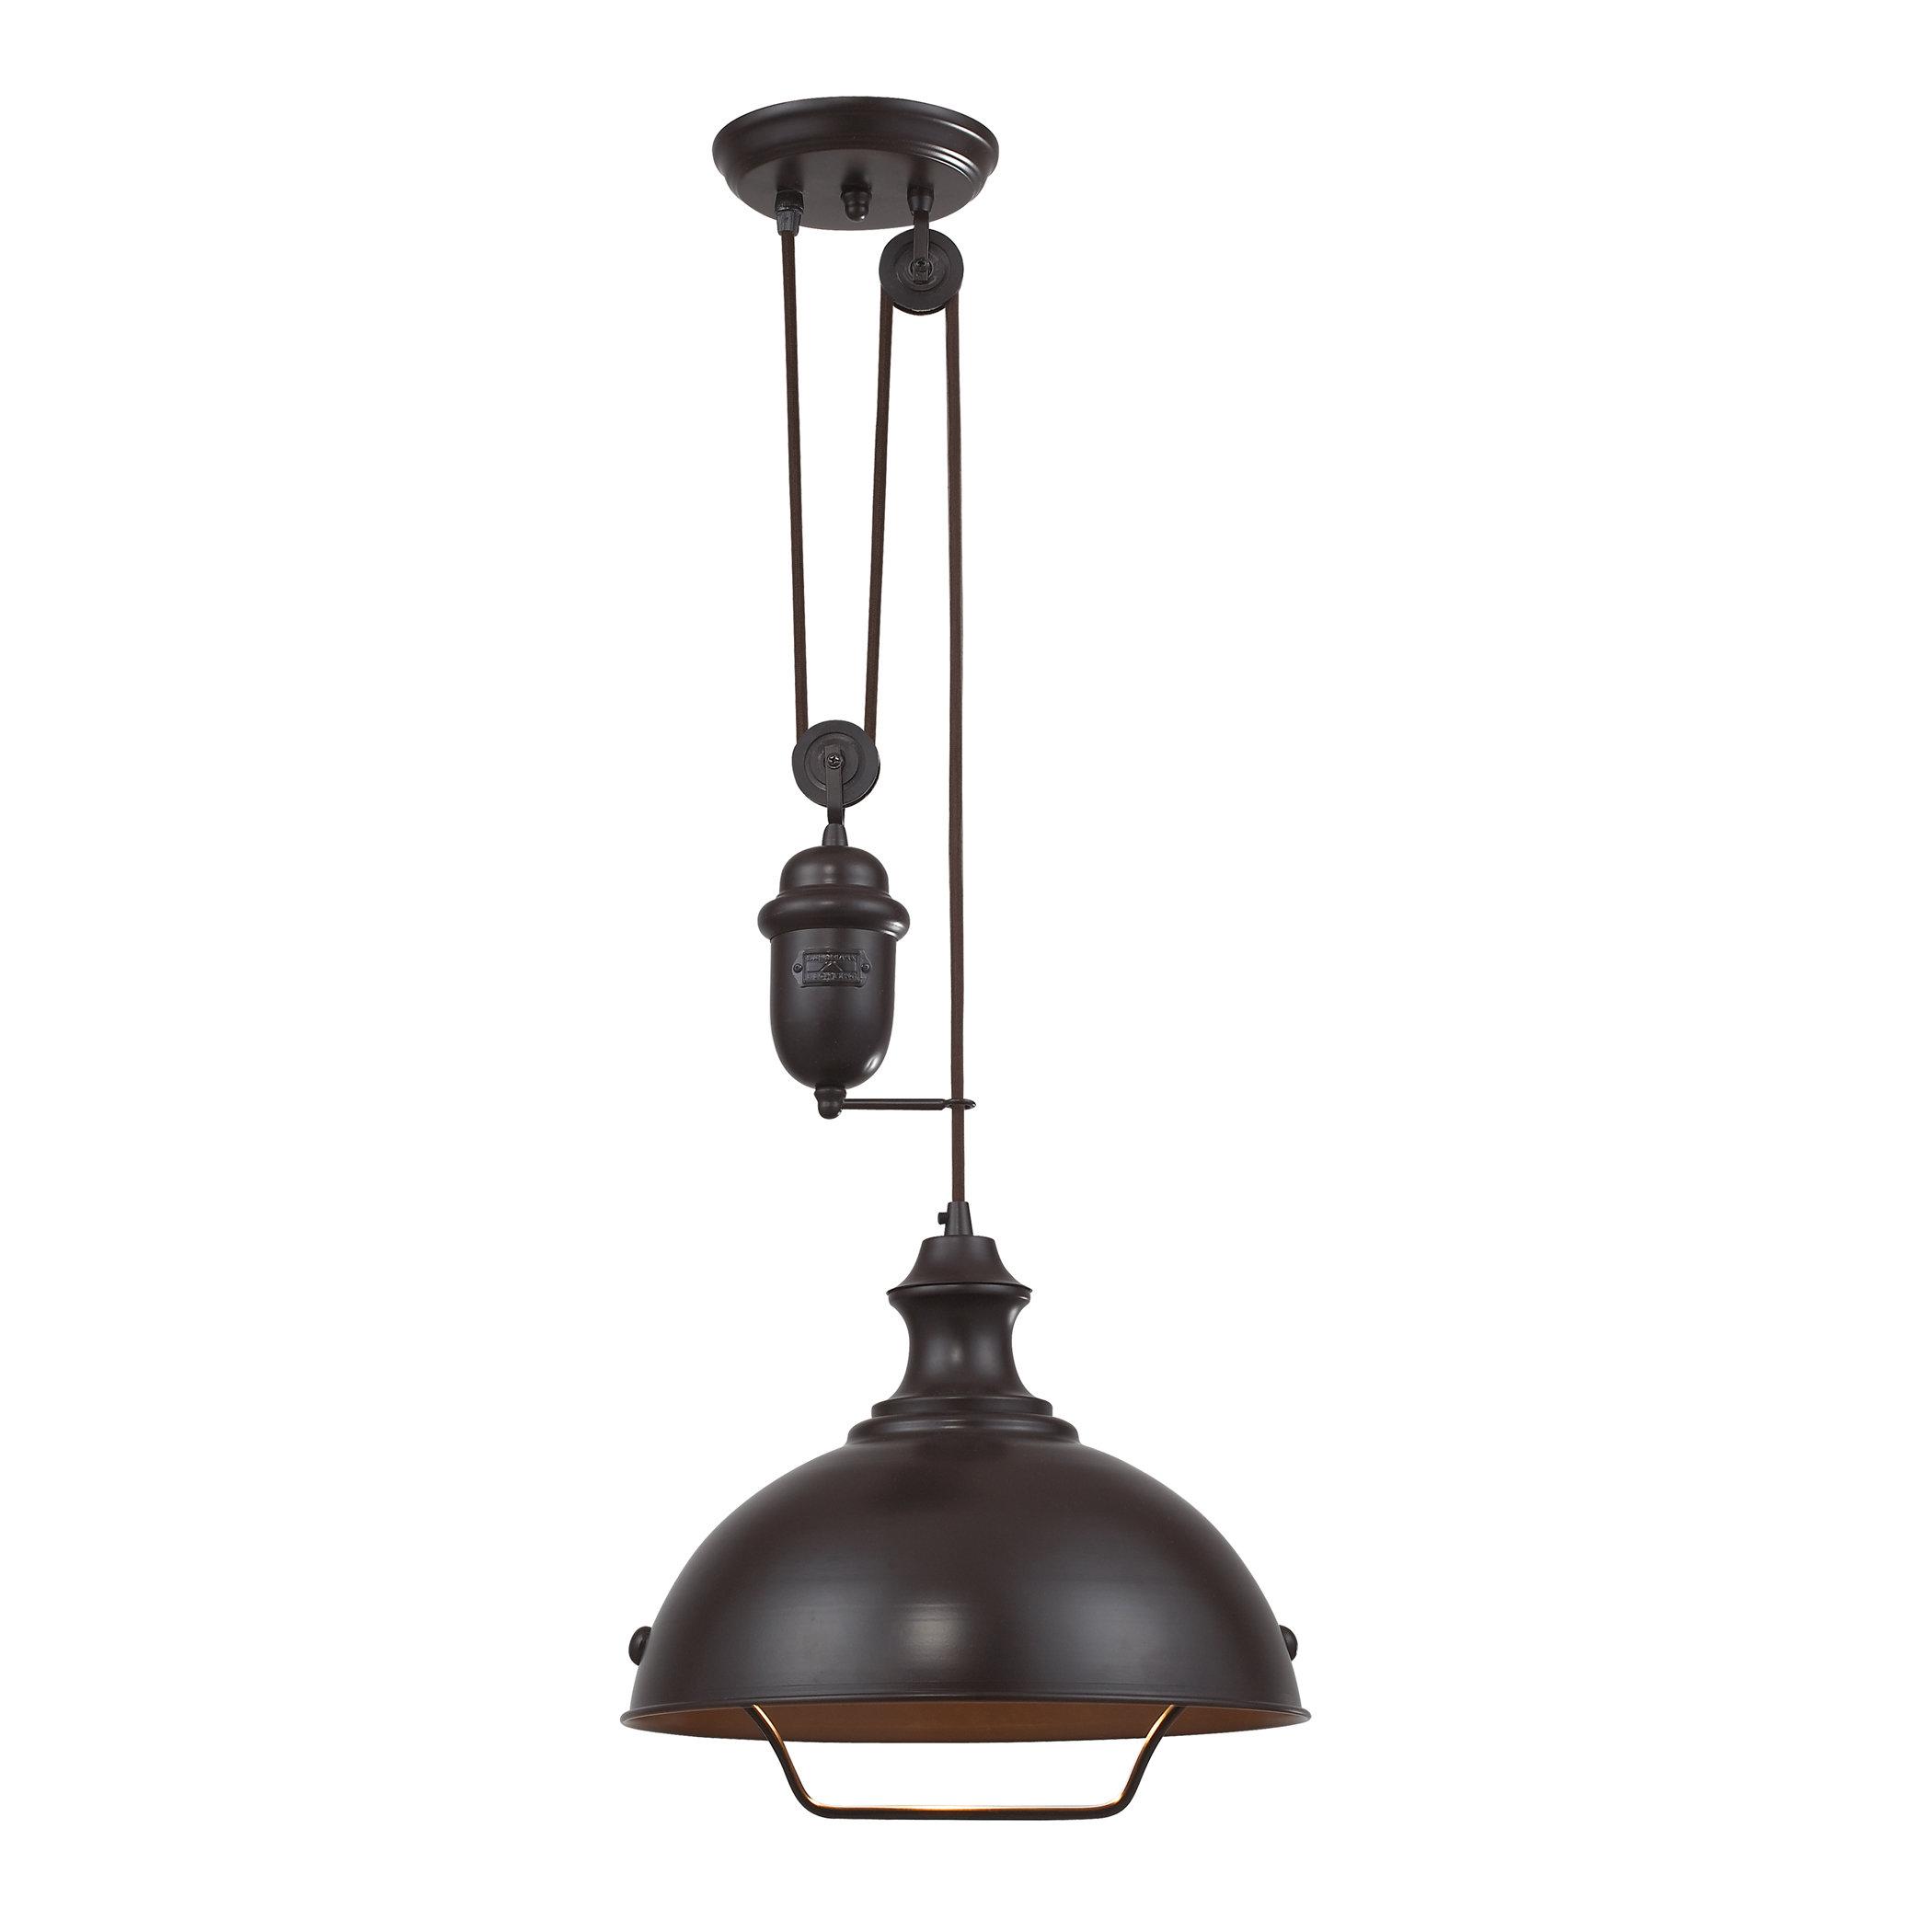 Legrand 1 Light Single Dome Pendant For Abordale 1 Light Single Dome Pendants (View 5 of 30)